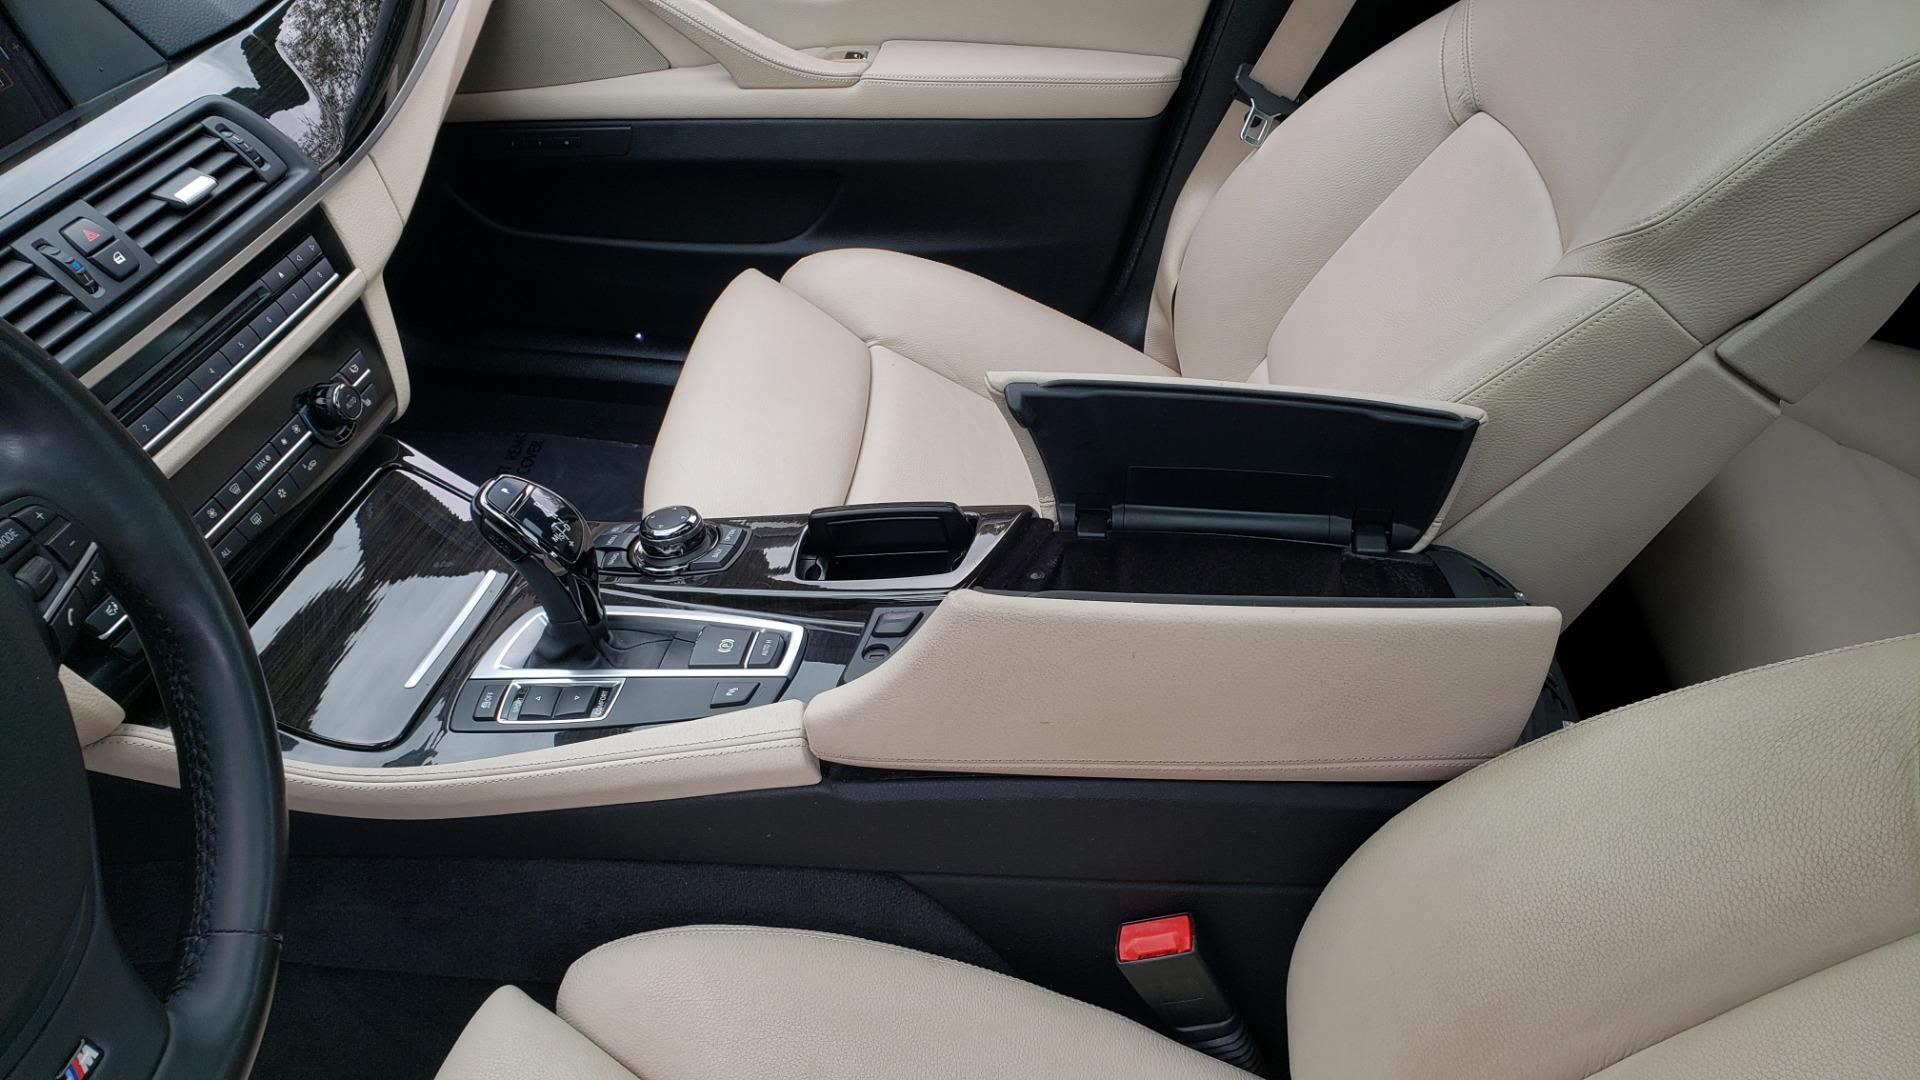 Used 2012 BMW 5 SERIES 550I M SPORT / NAV / CONV PKG / SUNROOF / PREM SND / REARVIEW for sale Sold at Formula Imports in Charlotte NC 28227 47